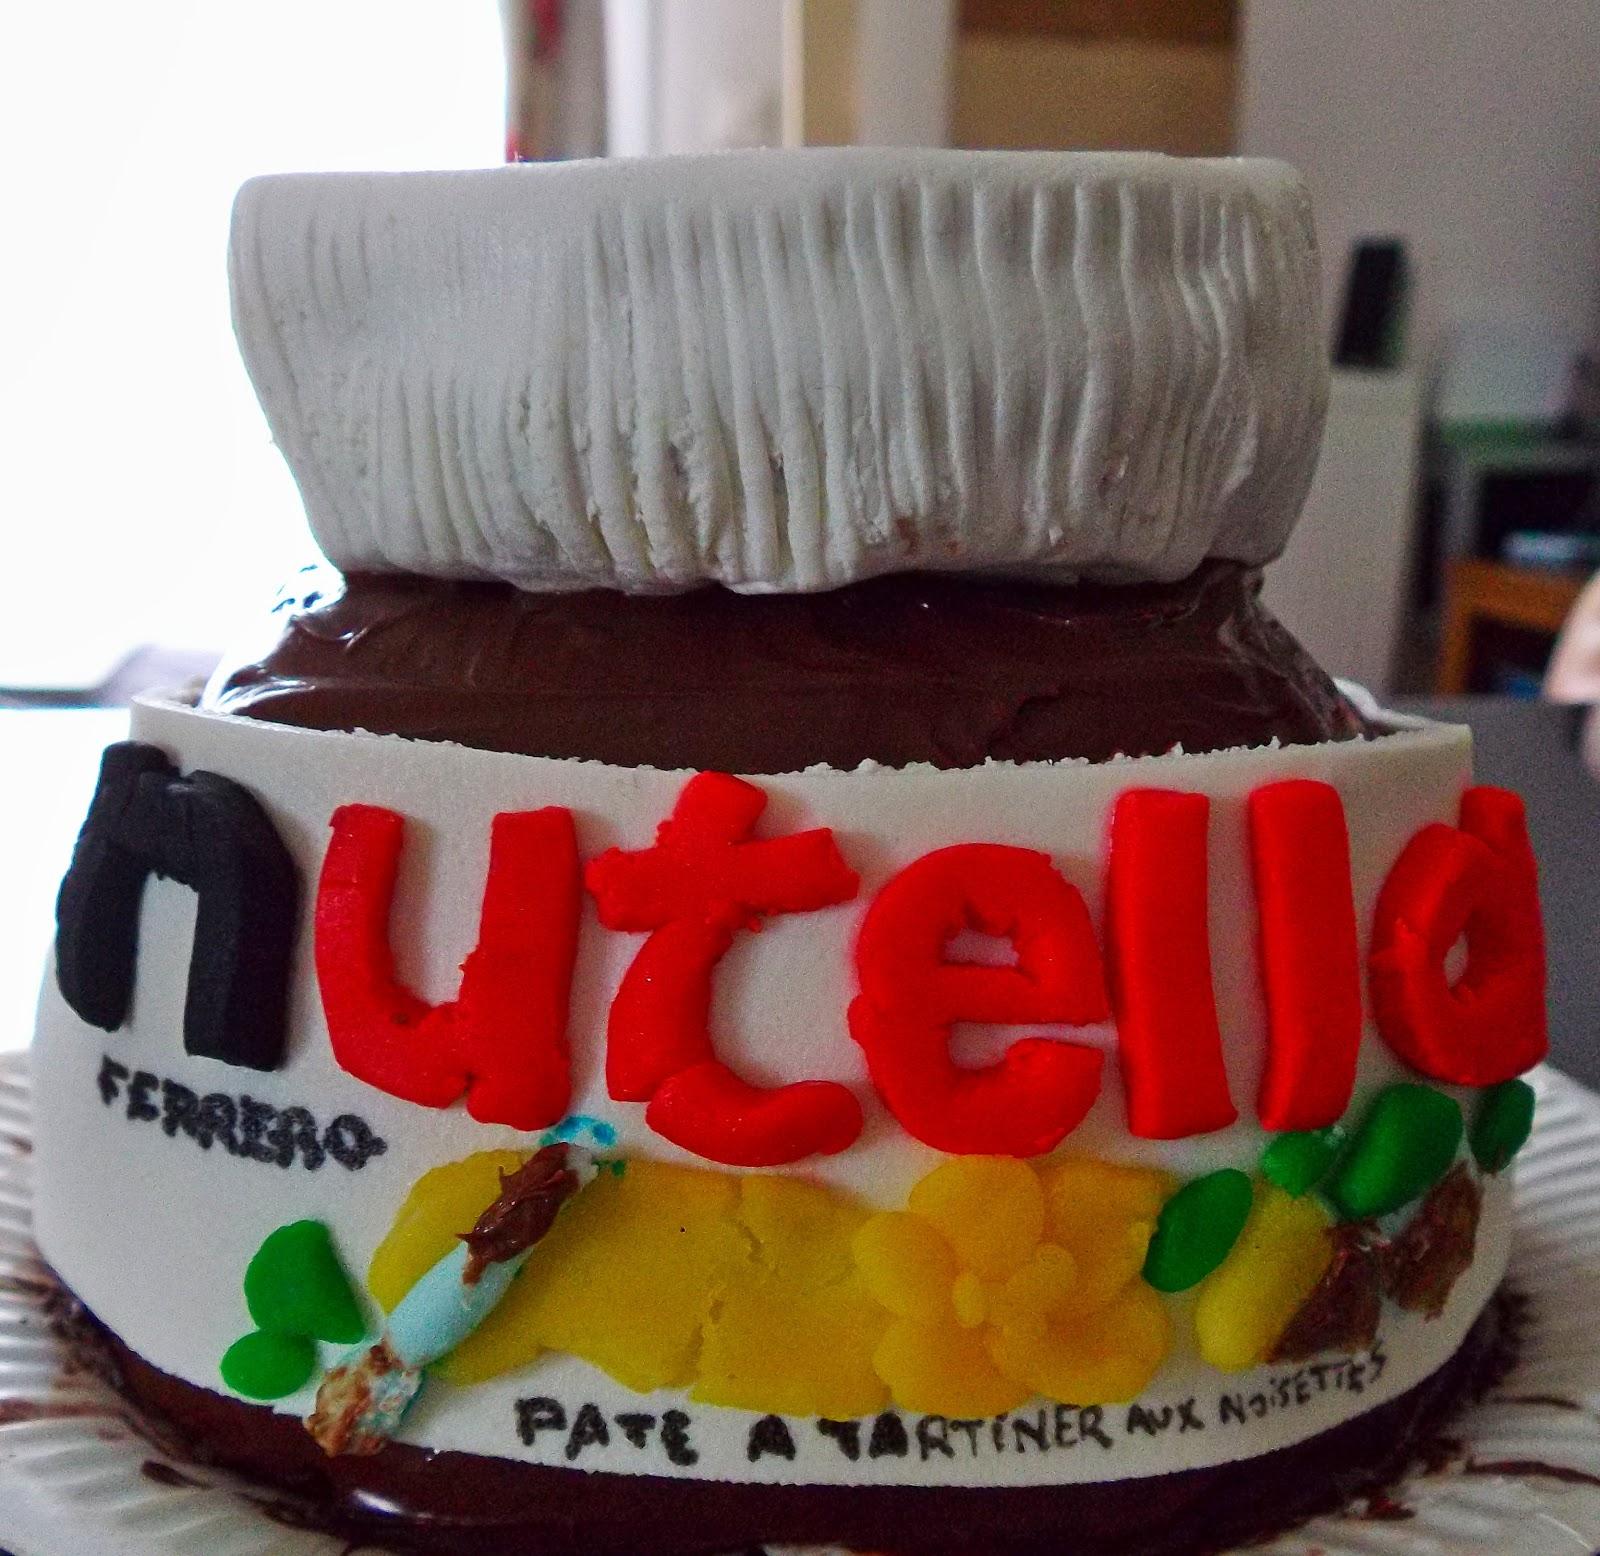 Fabuleux GATEAU GAGA - Love cakes: Le pot de Nutella EK39